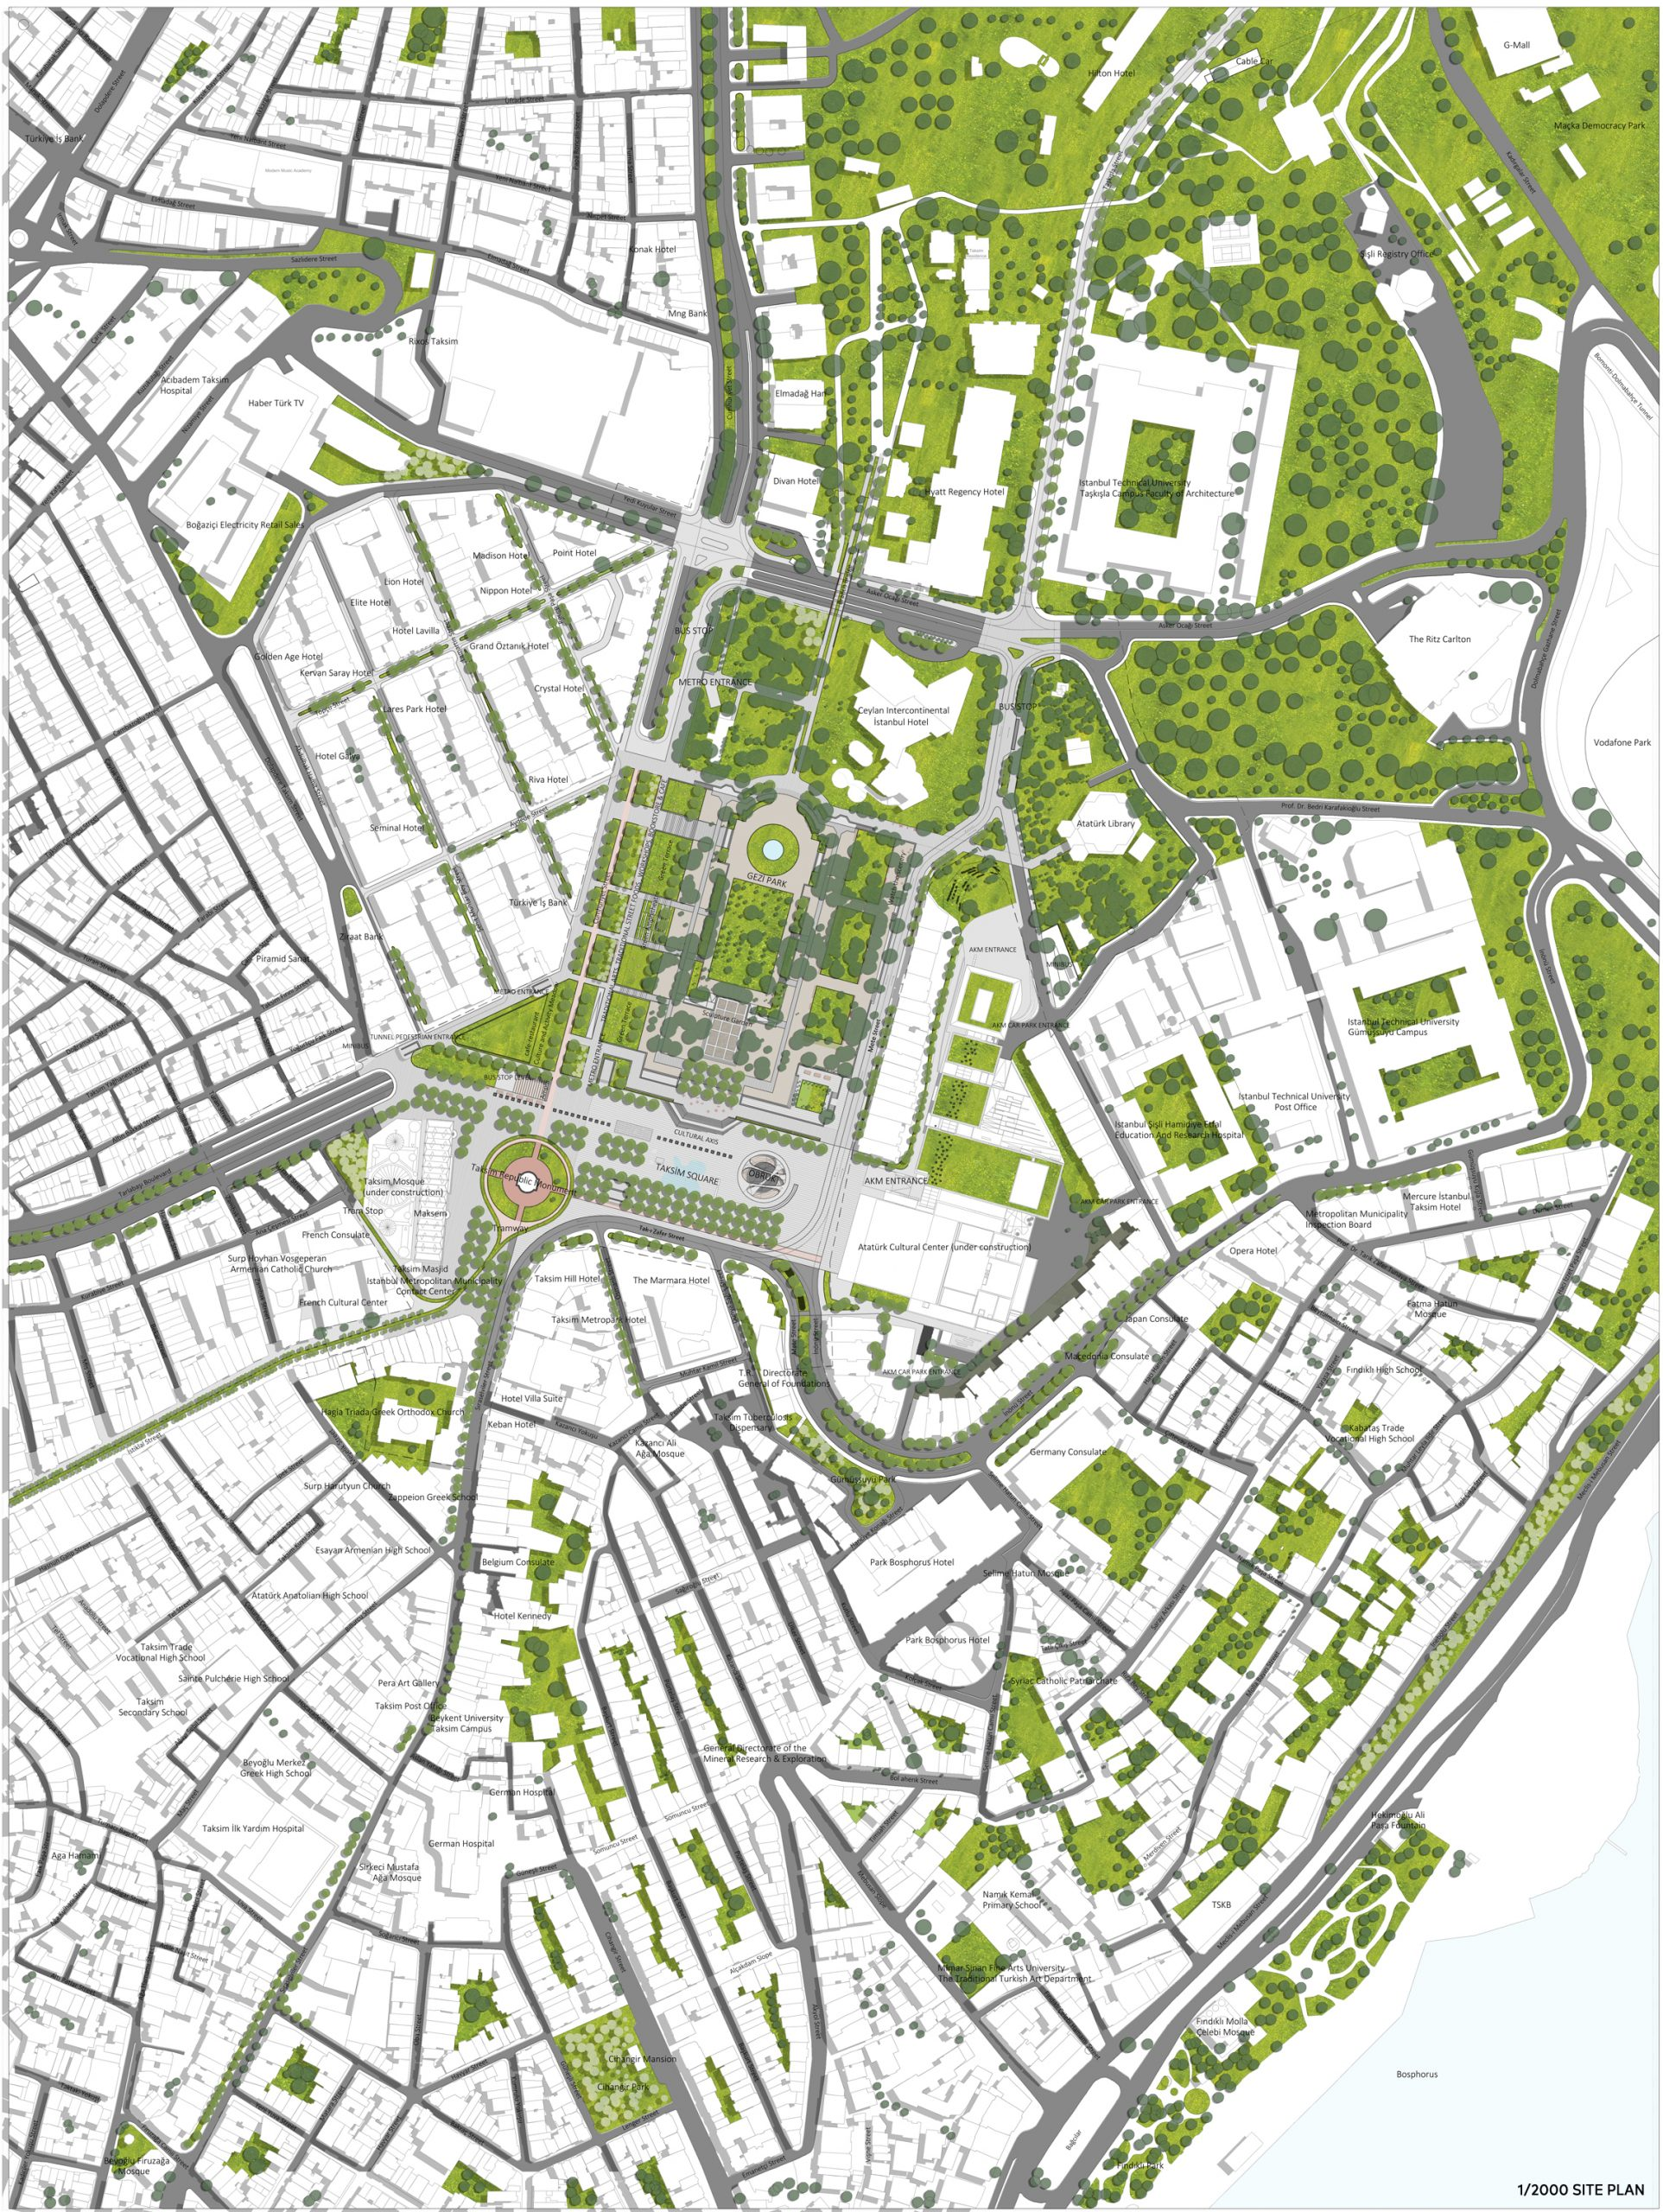 2000-site plan